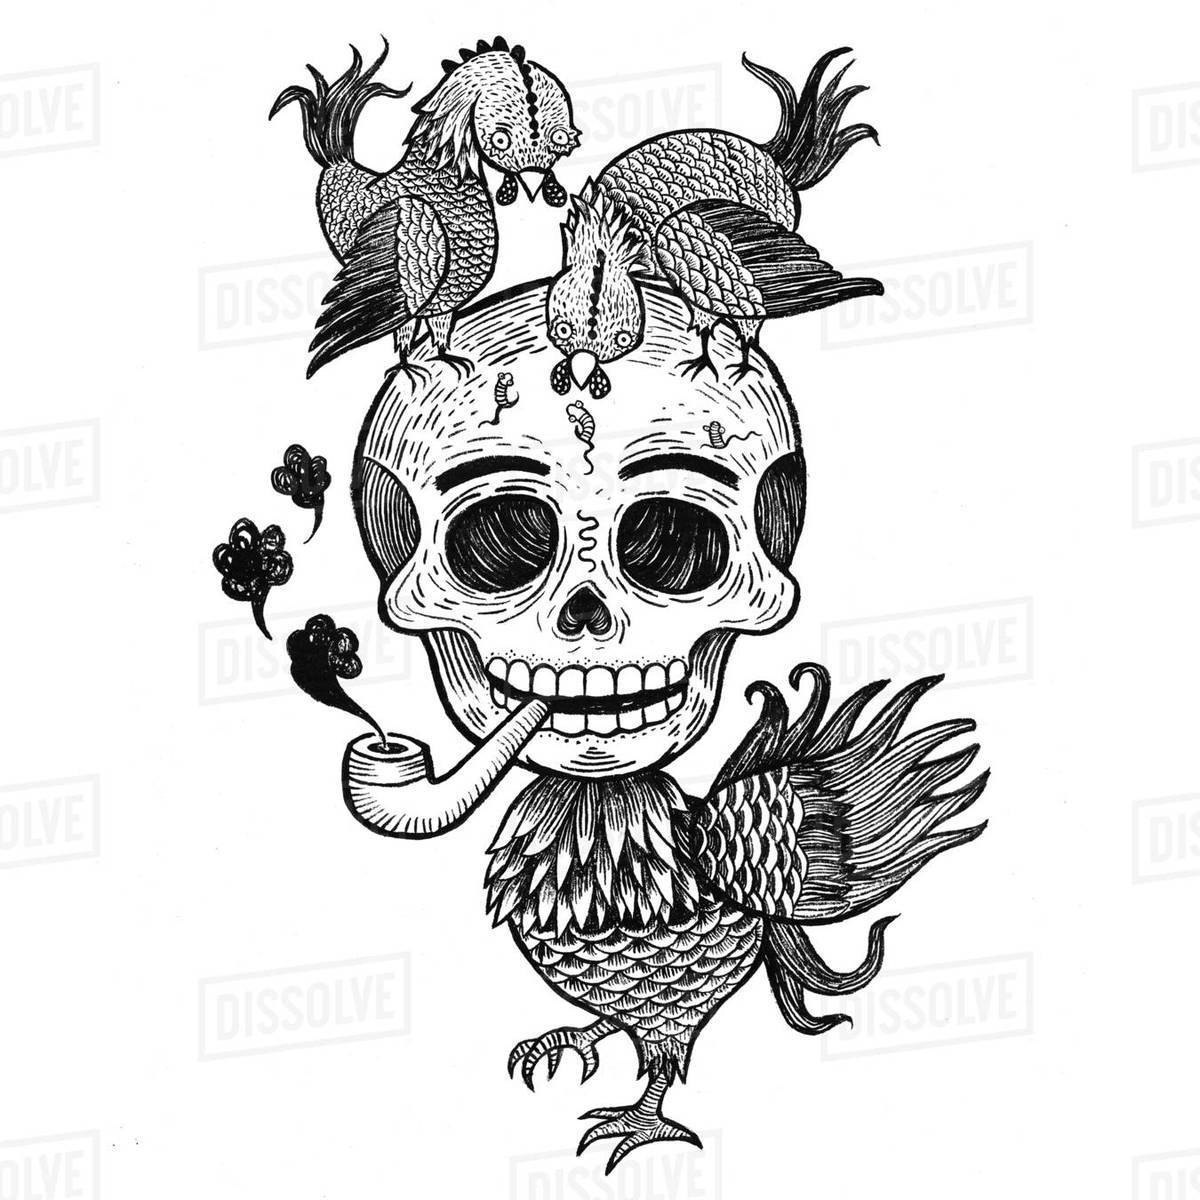 Illustration of chicken skull smoking against white background Royalty-free stock photo